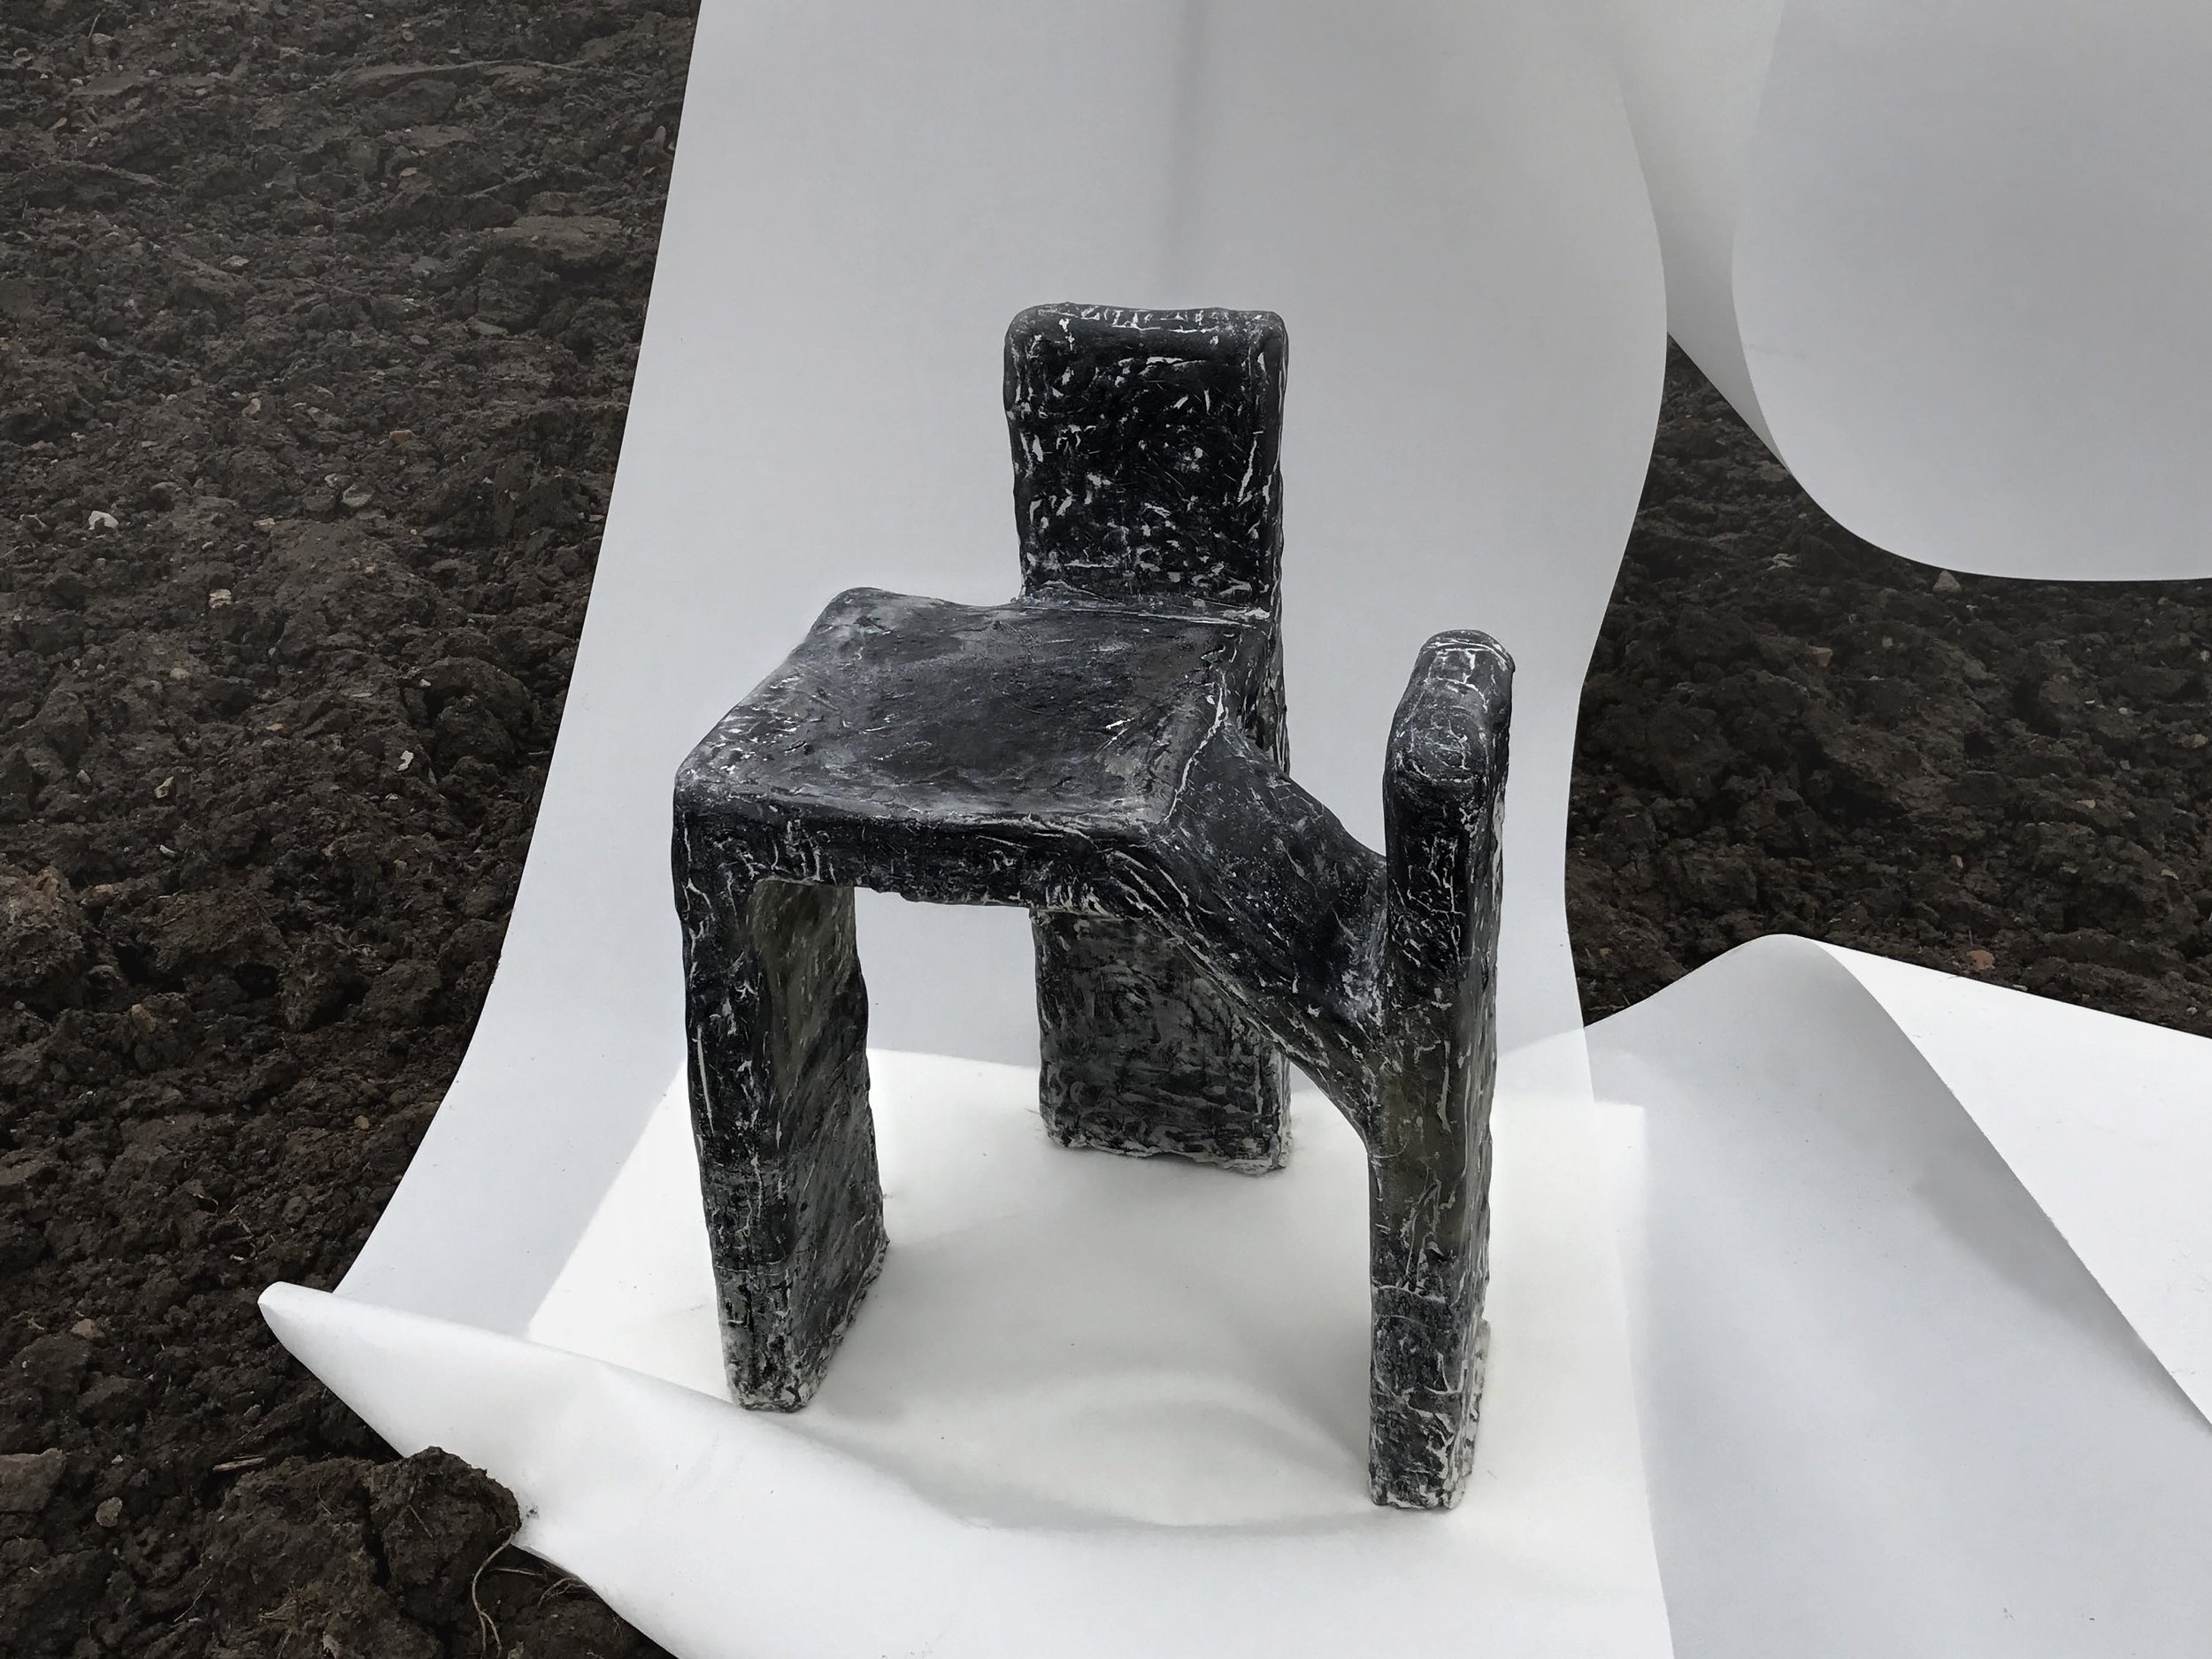 Three-Pillar Seat   by Ida Elke, created for the  Age of Man  exhibition, Milan Design Week 2017